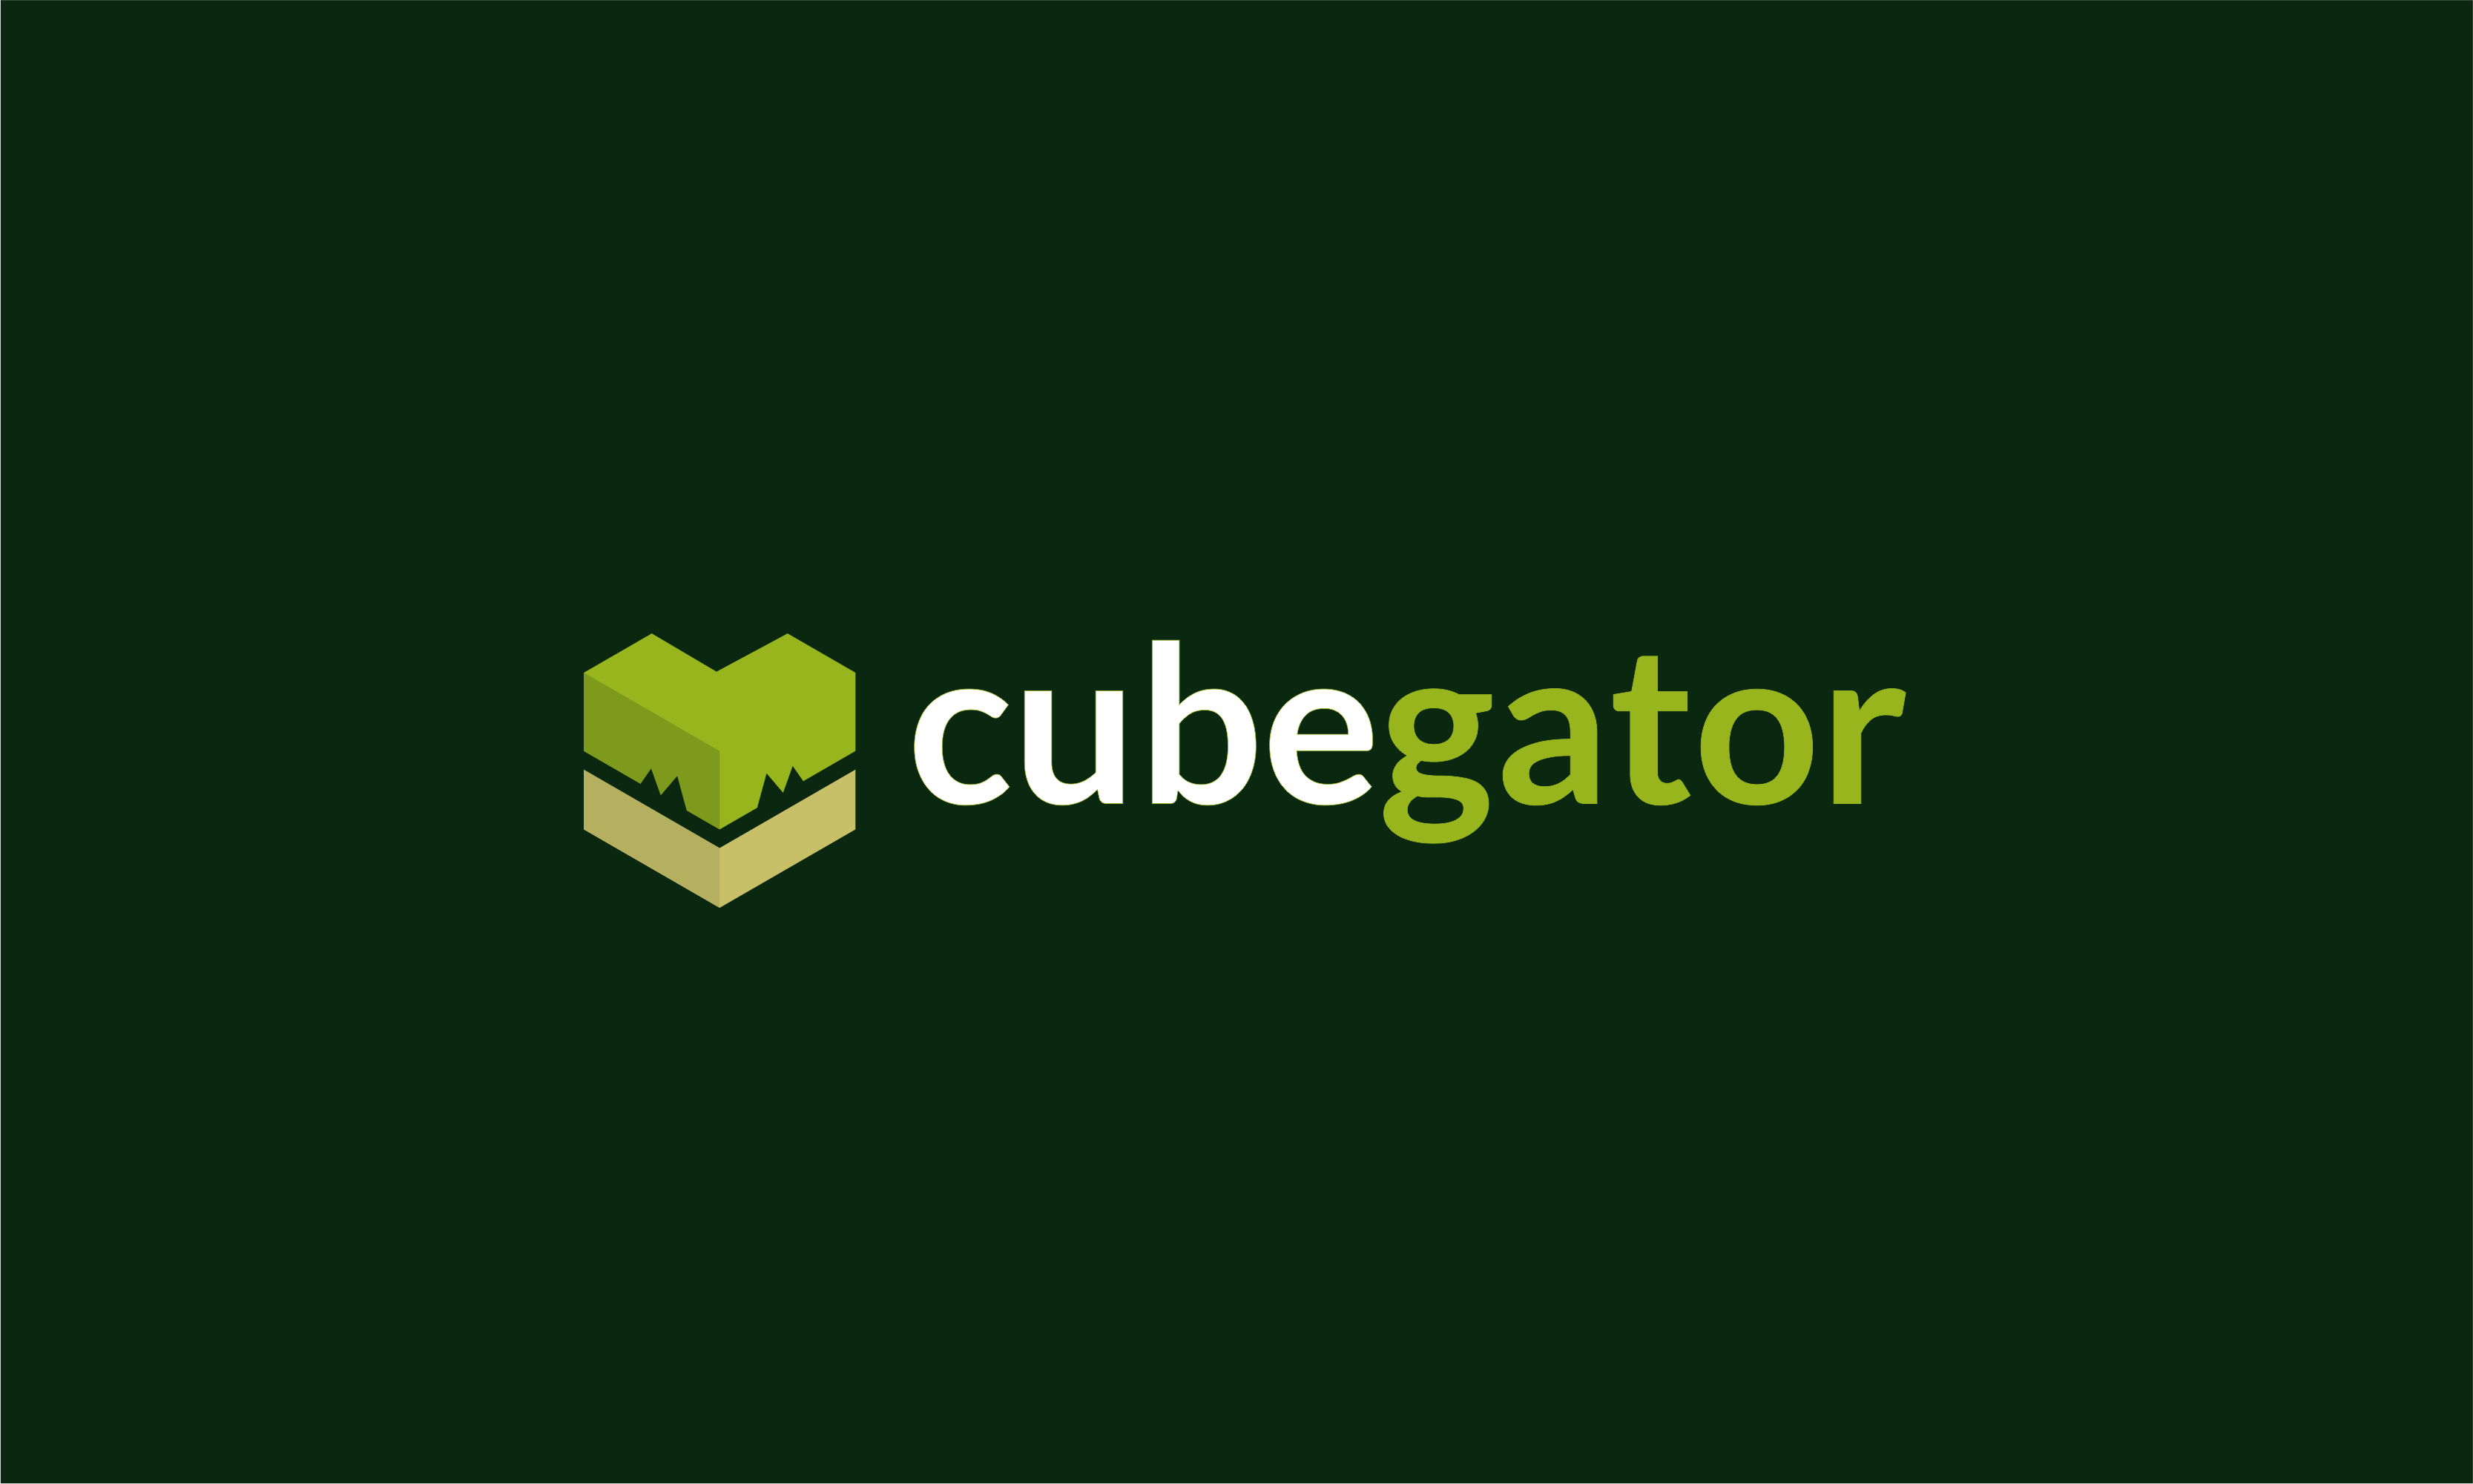 Cubegator